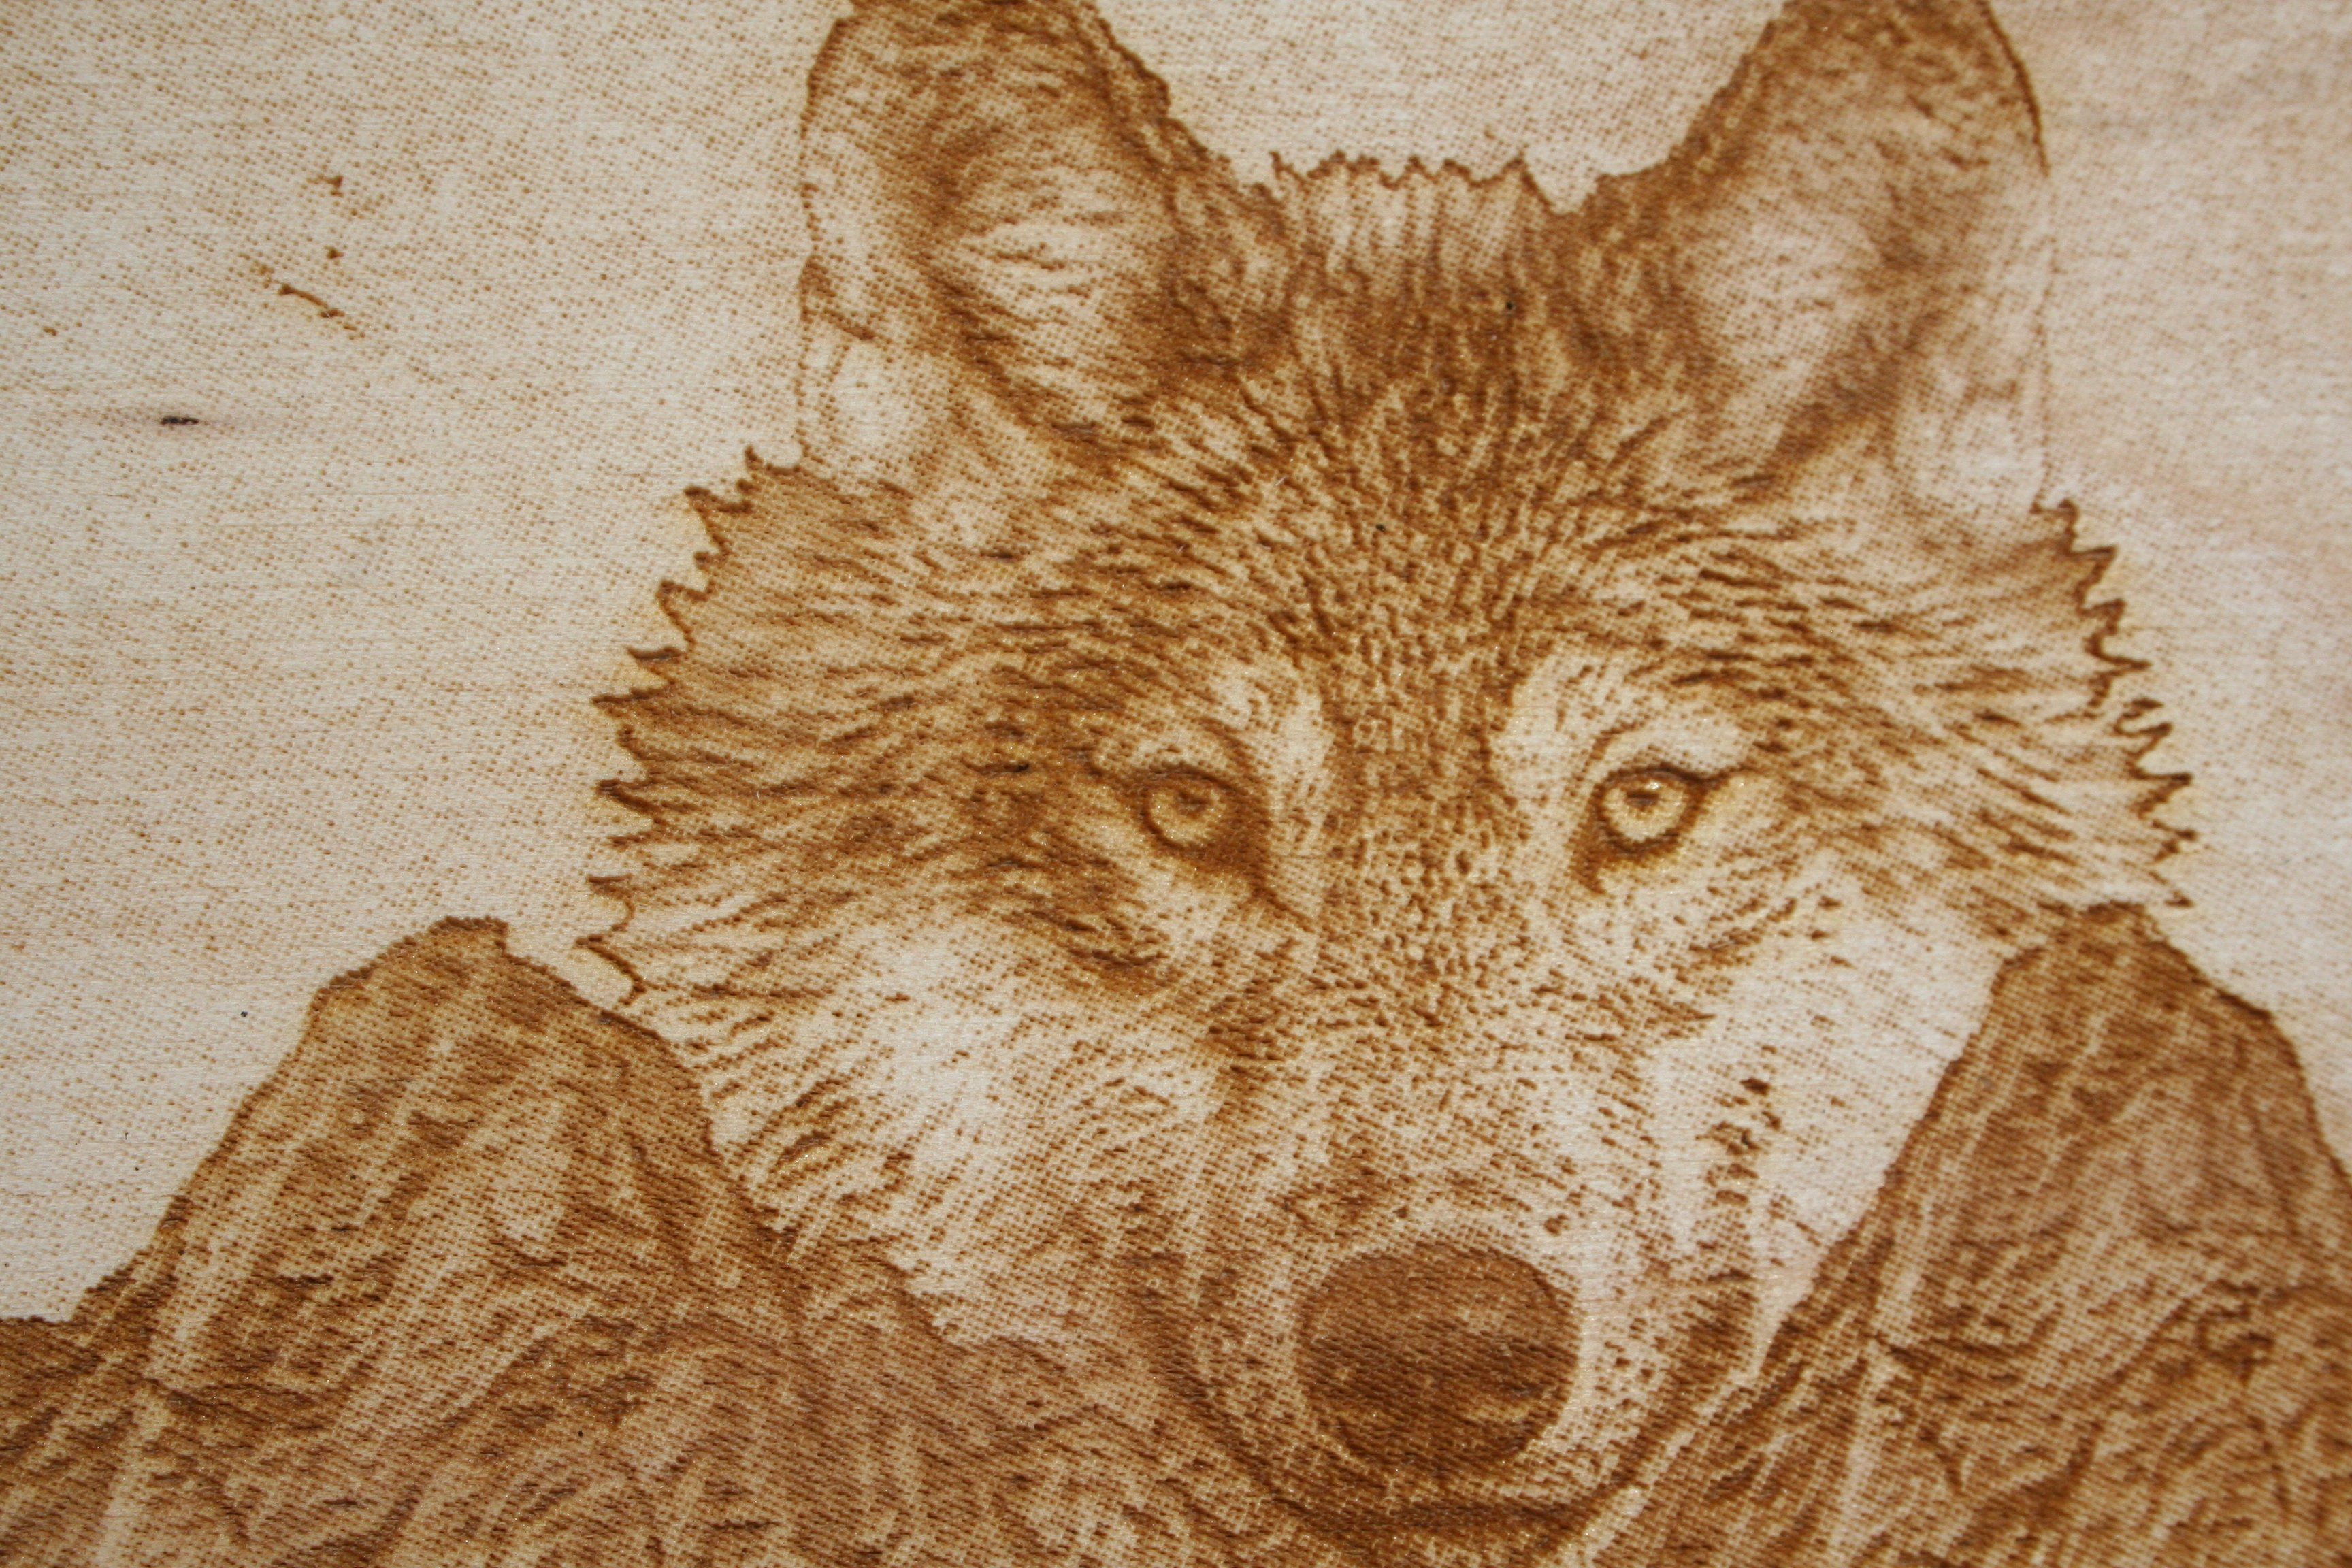 8e7ebb7aabb1e47d717720fabb70f748 - Wolf & Mountain Laser Engraved Wall Art - work-from-home